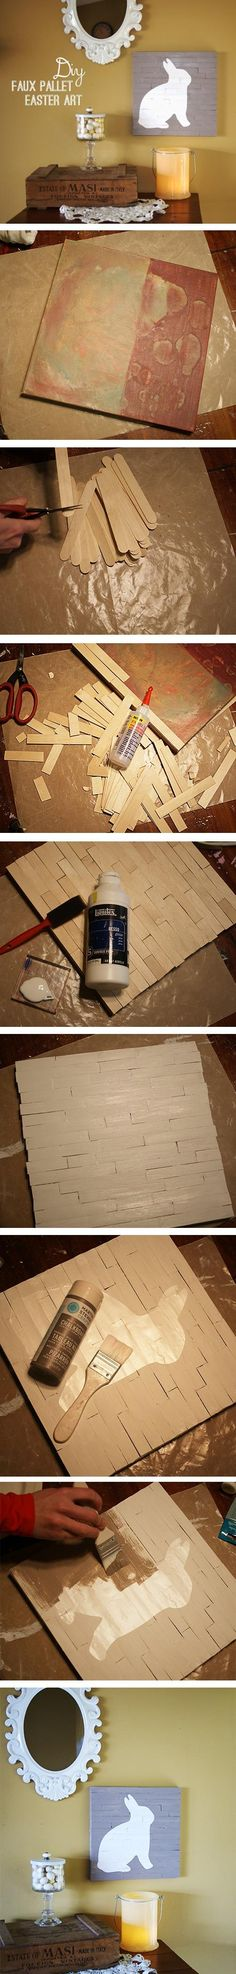 Make Faux Wood Pallet Art